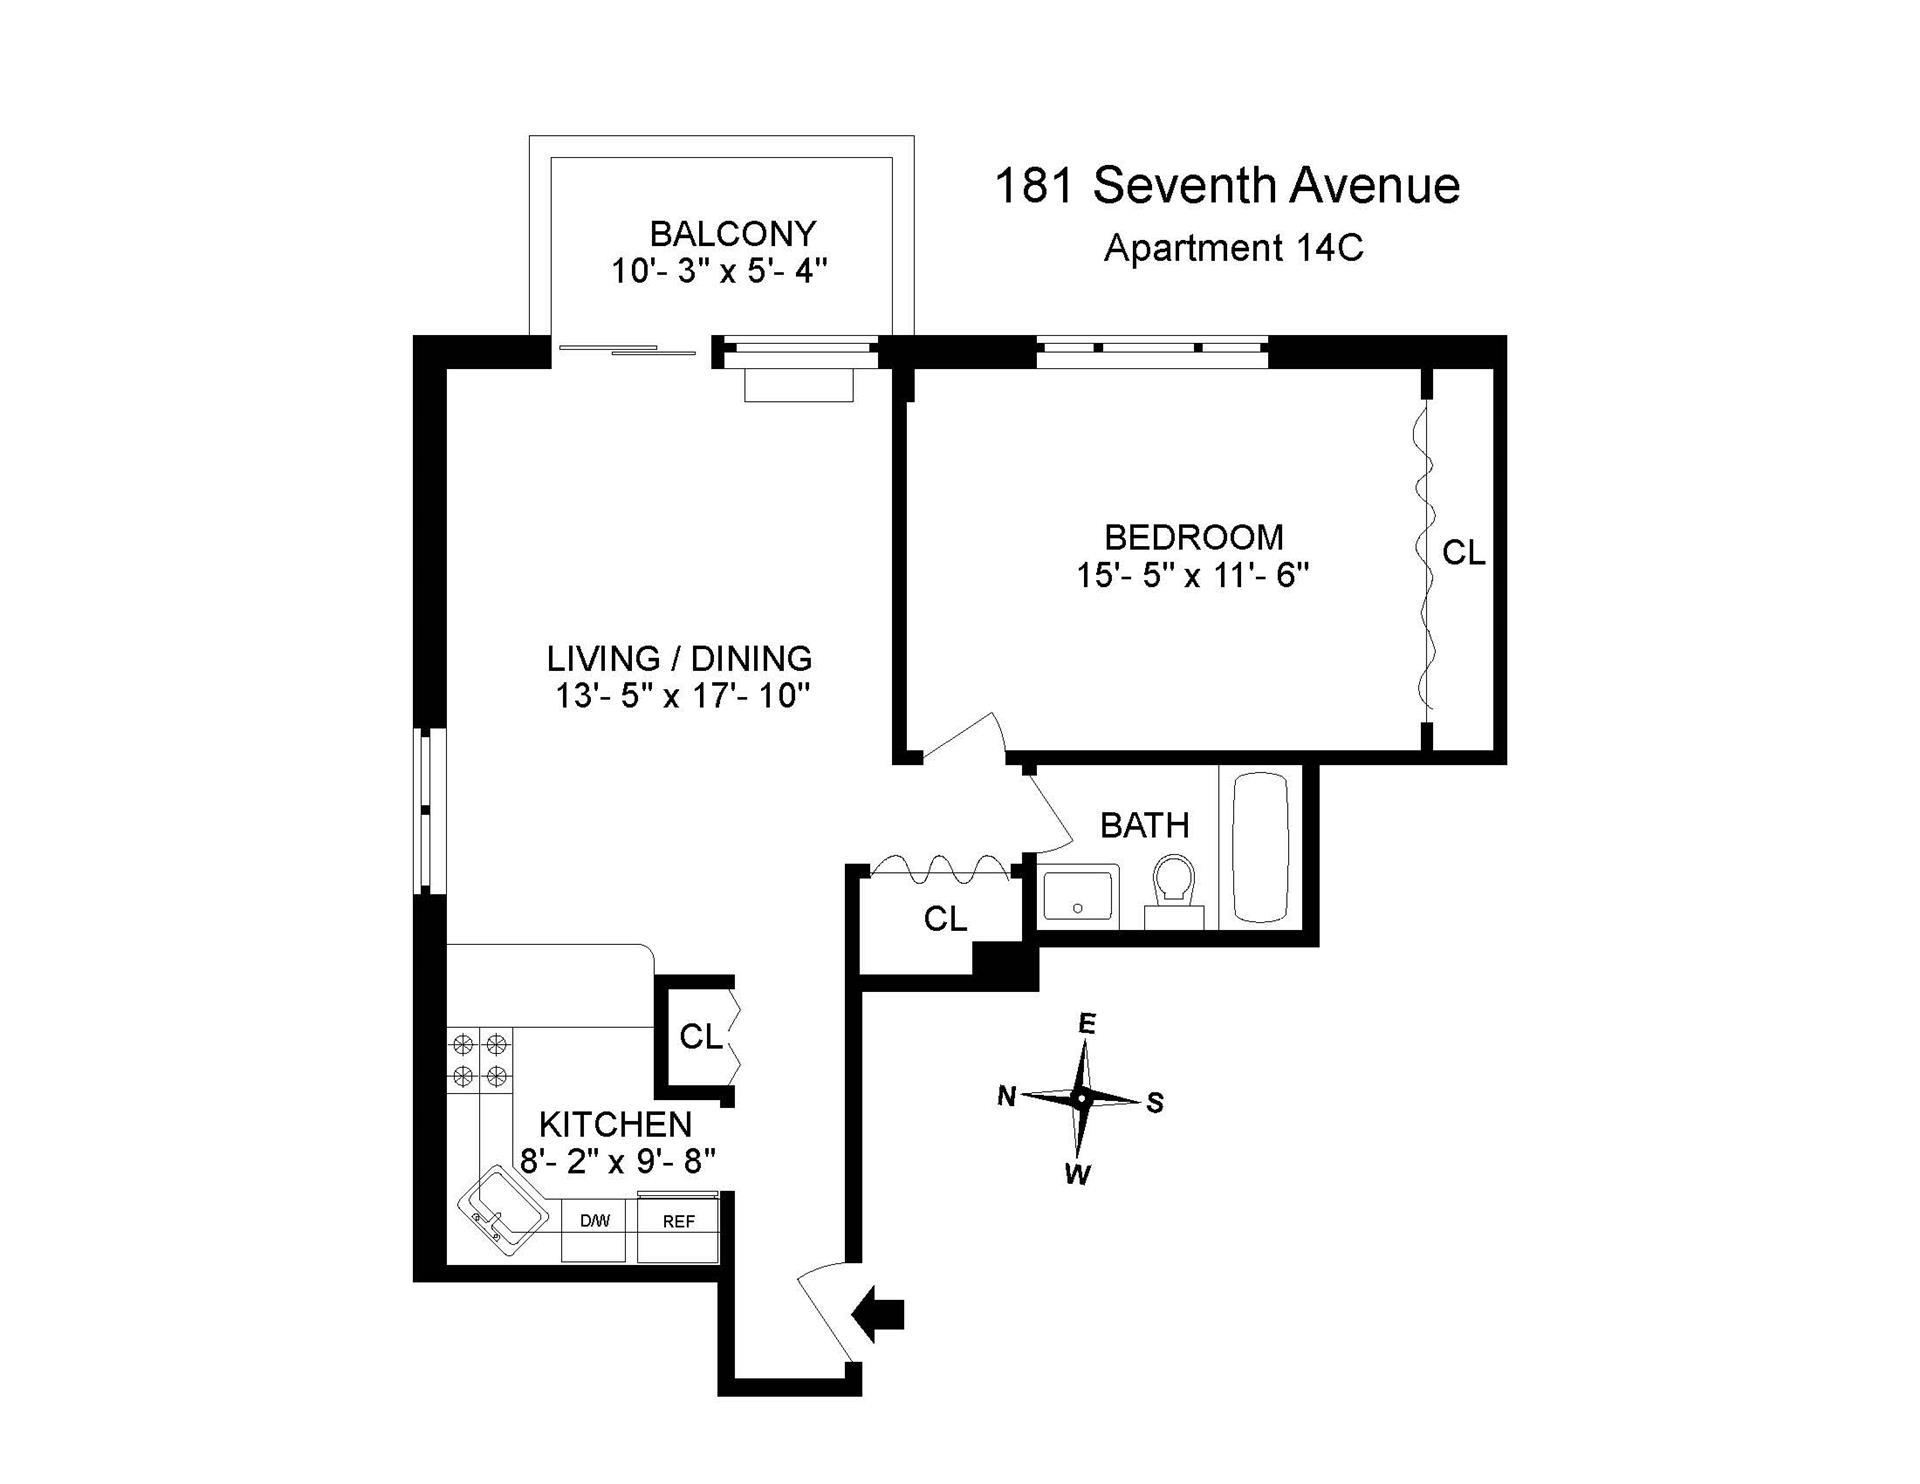 Floor plan of The Atrium at Chelsea, 181 Seventh Avenue, 14C - Chelsea, New York